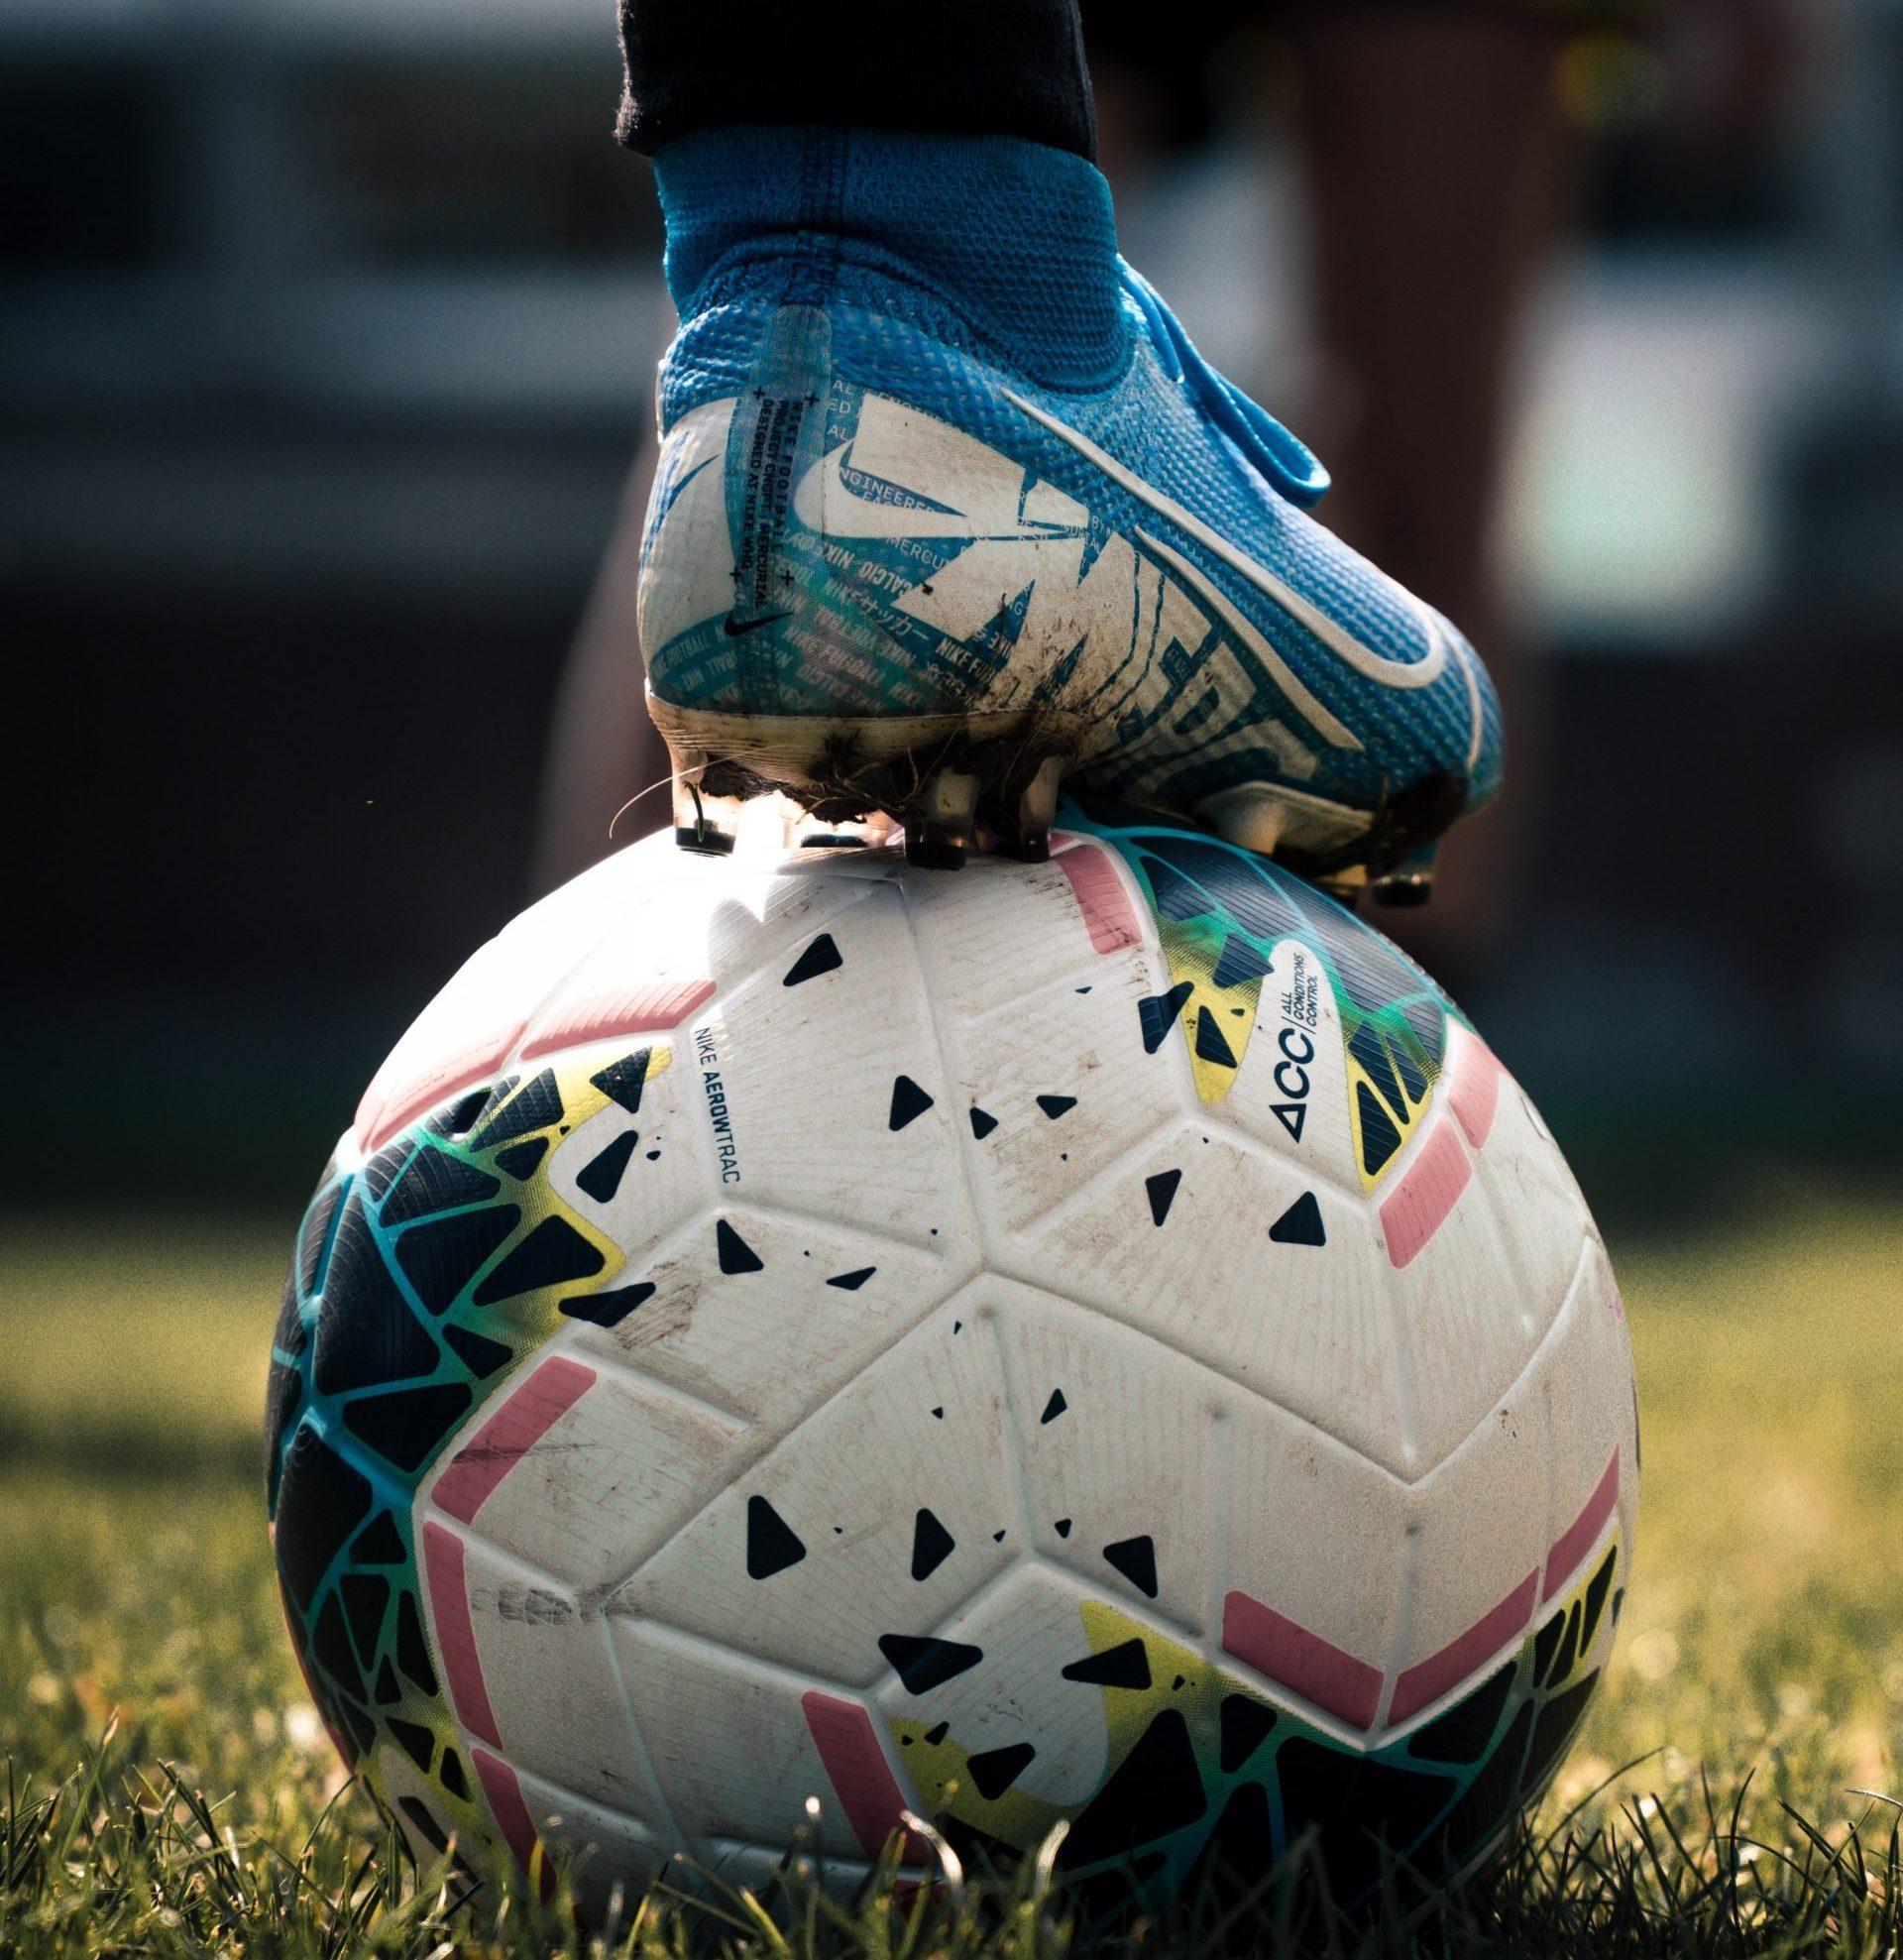 fodbold Foto: Unpslash)